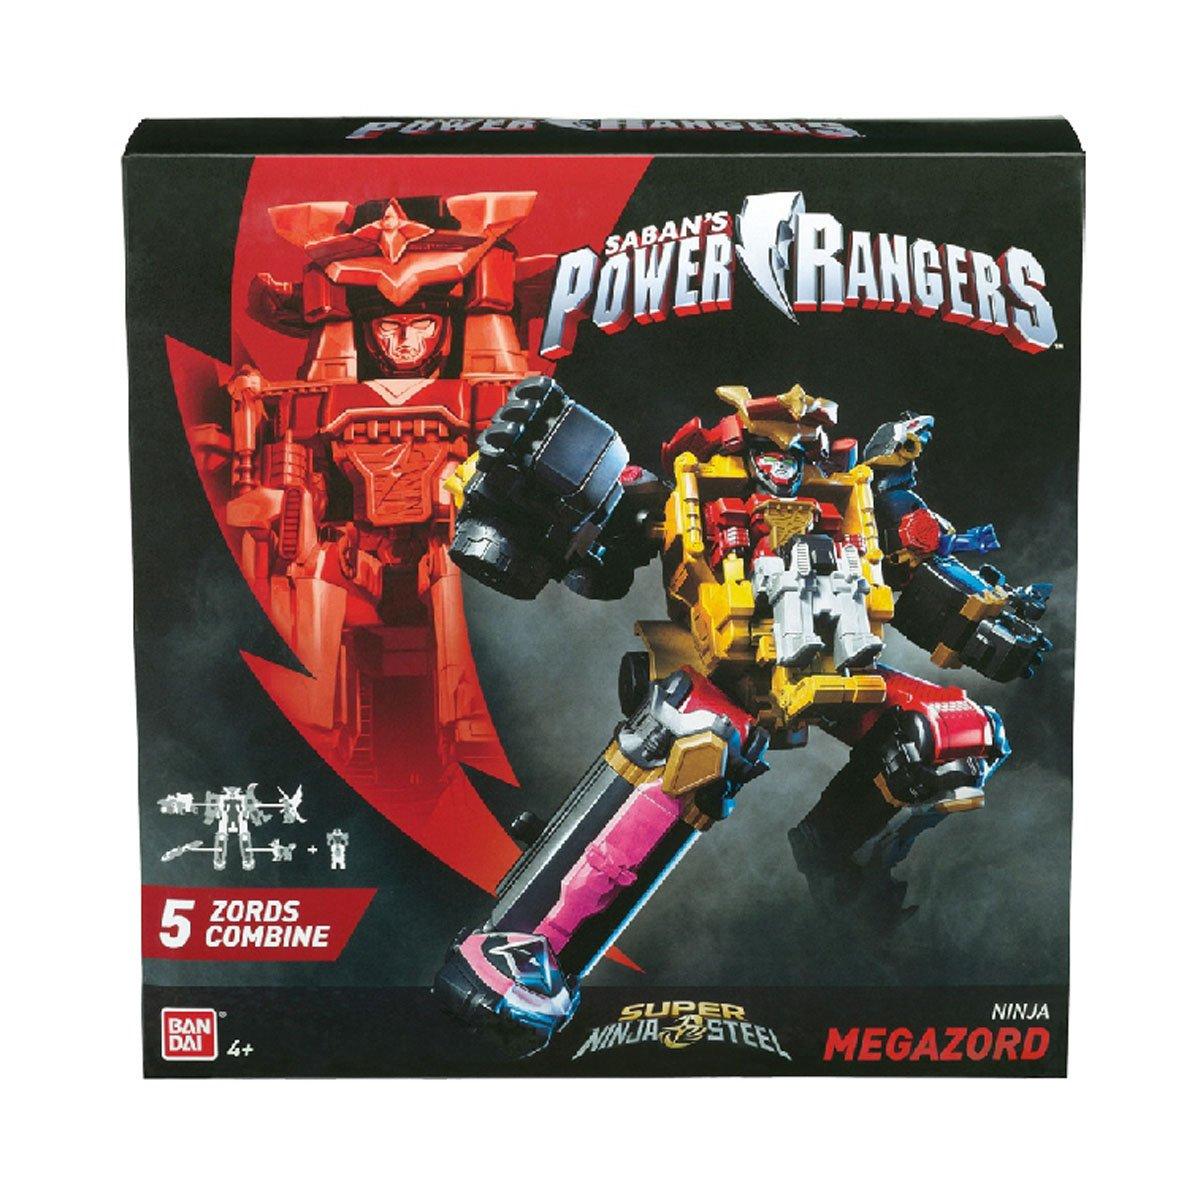 Power Ranger Megazord Bandai